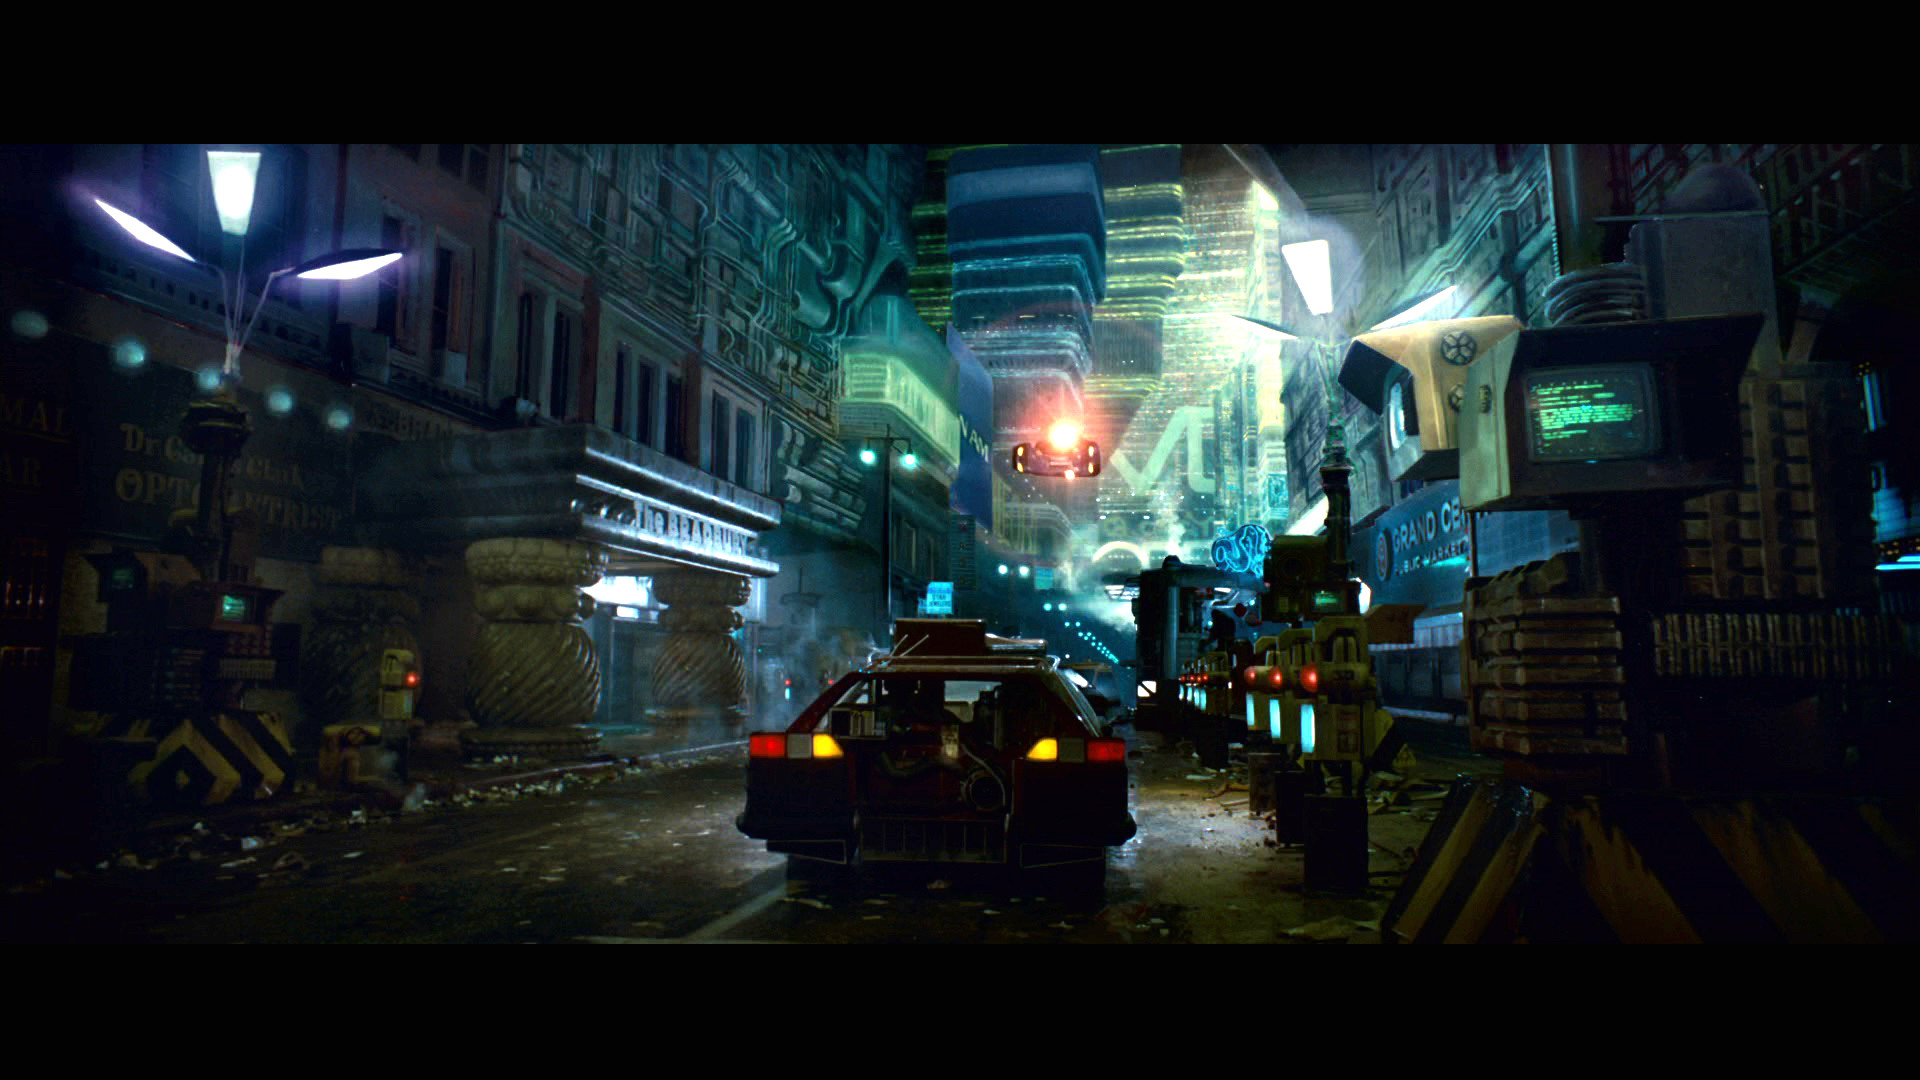 BLADE RUNNER drama sci-Fi thriller action city fs wallpaper background